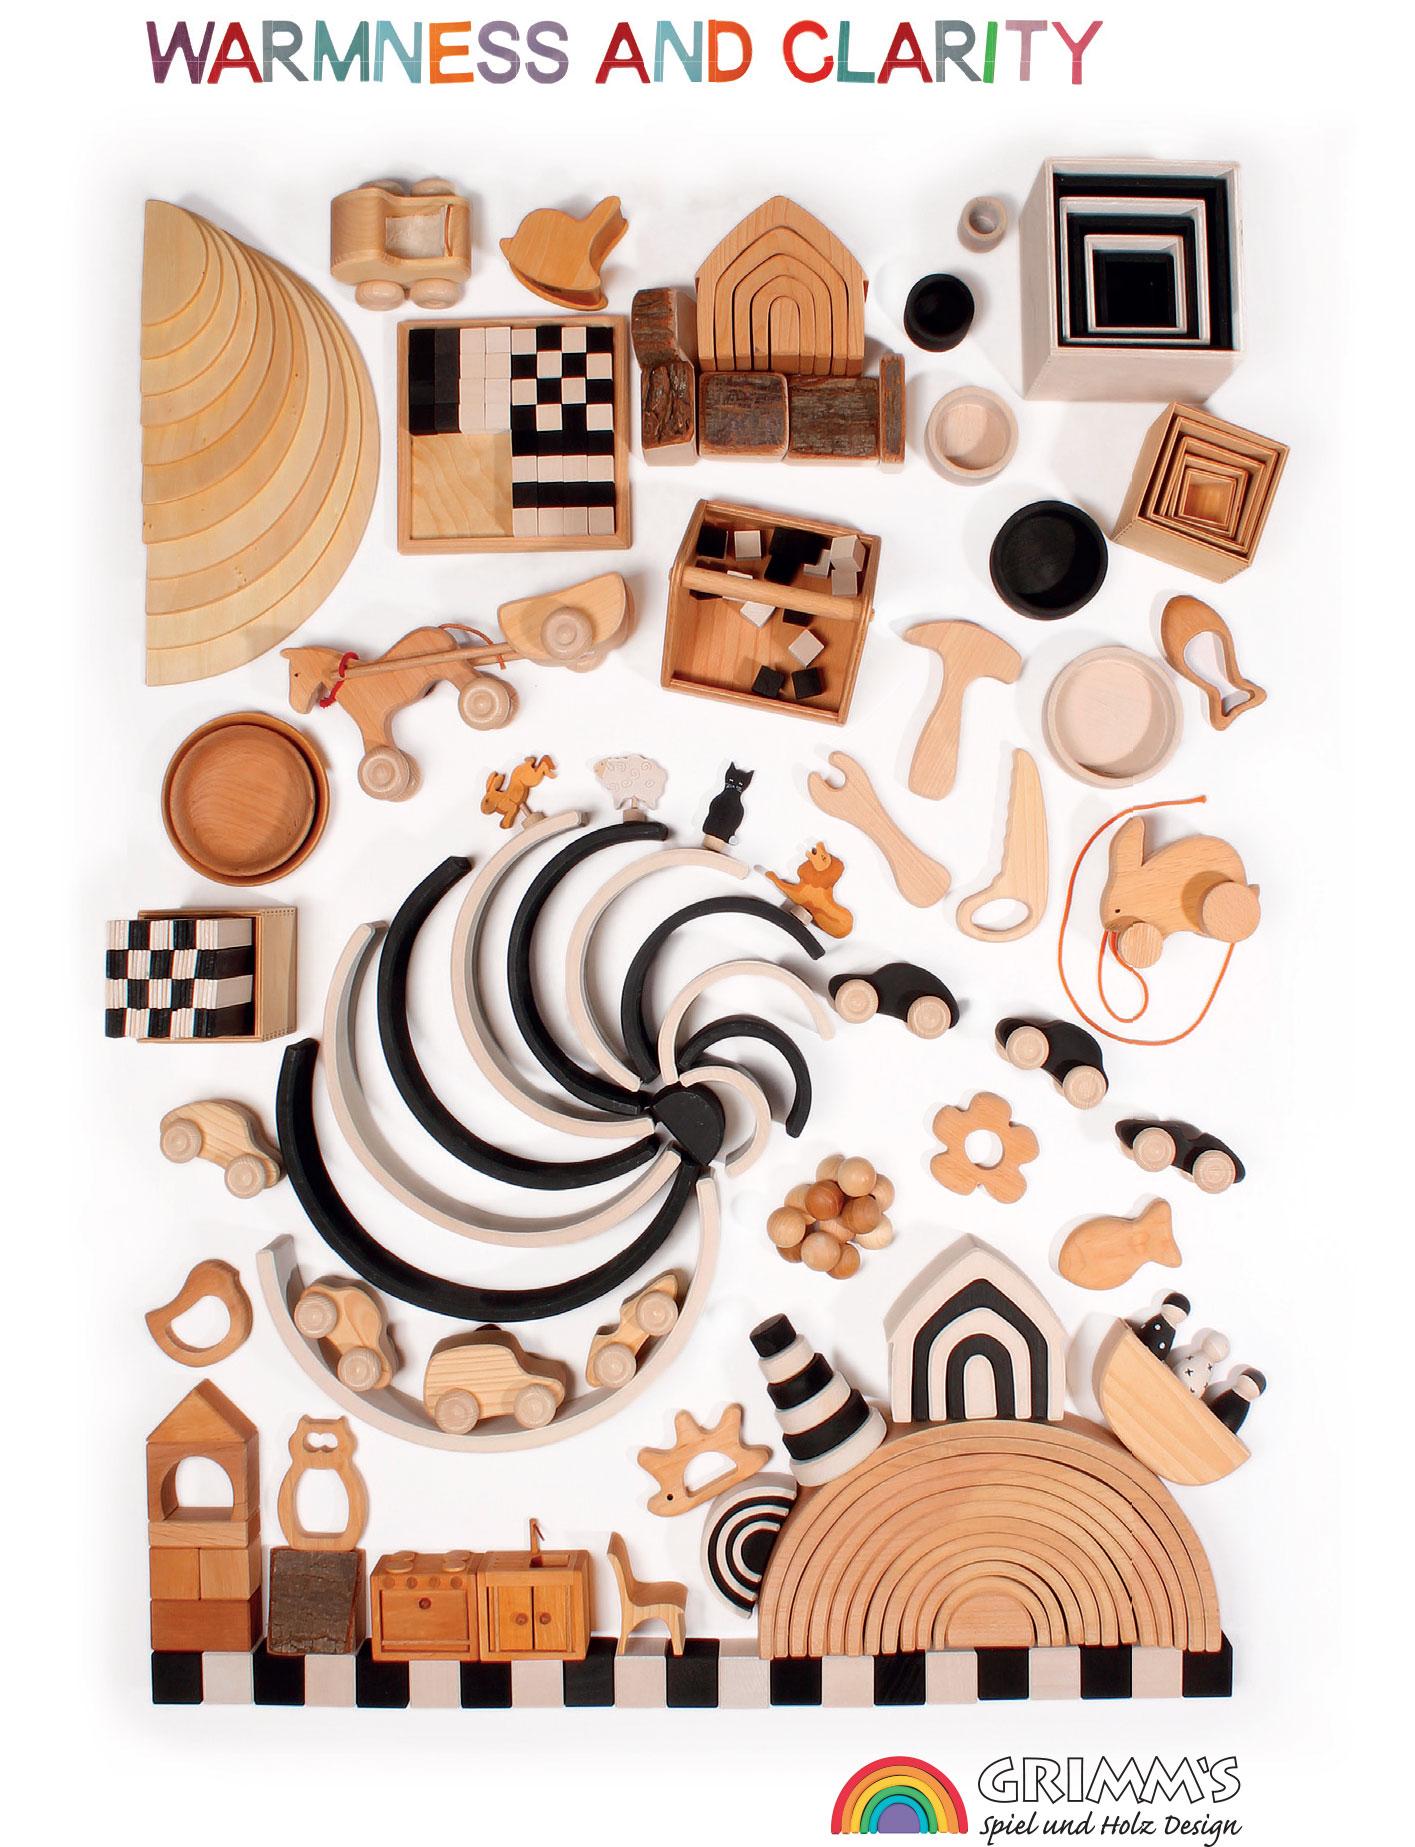 drewniane zabawki grimms naturalne